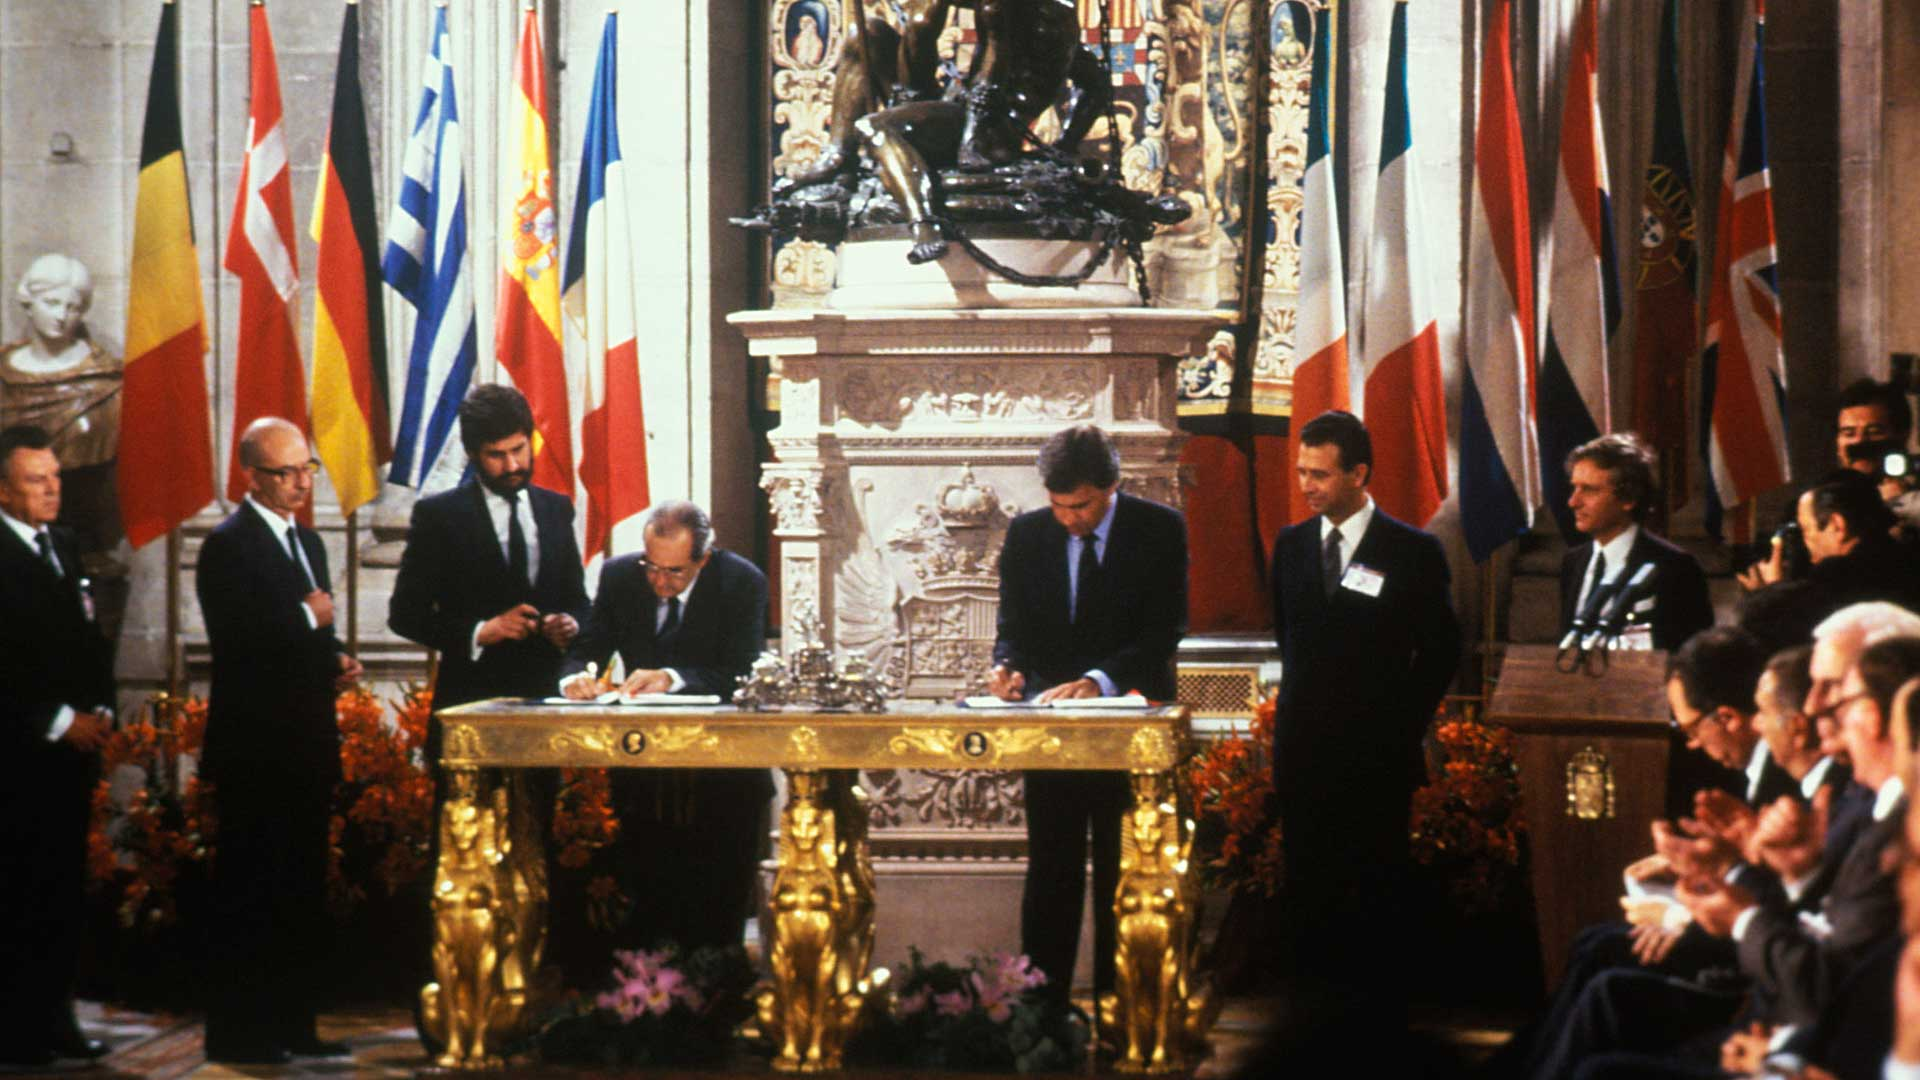 CEE i Franco article Carreras